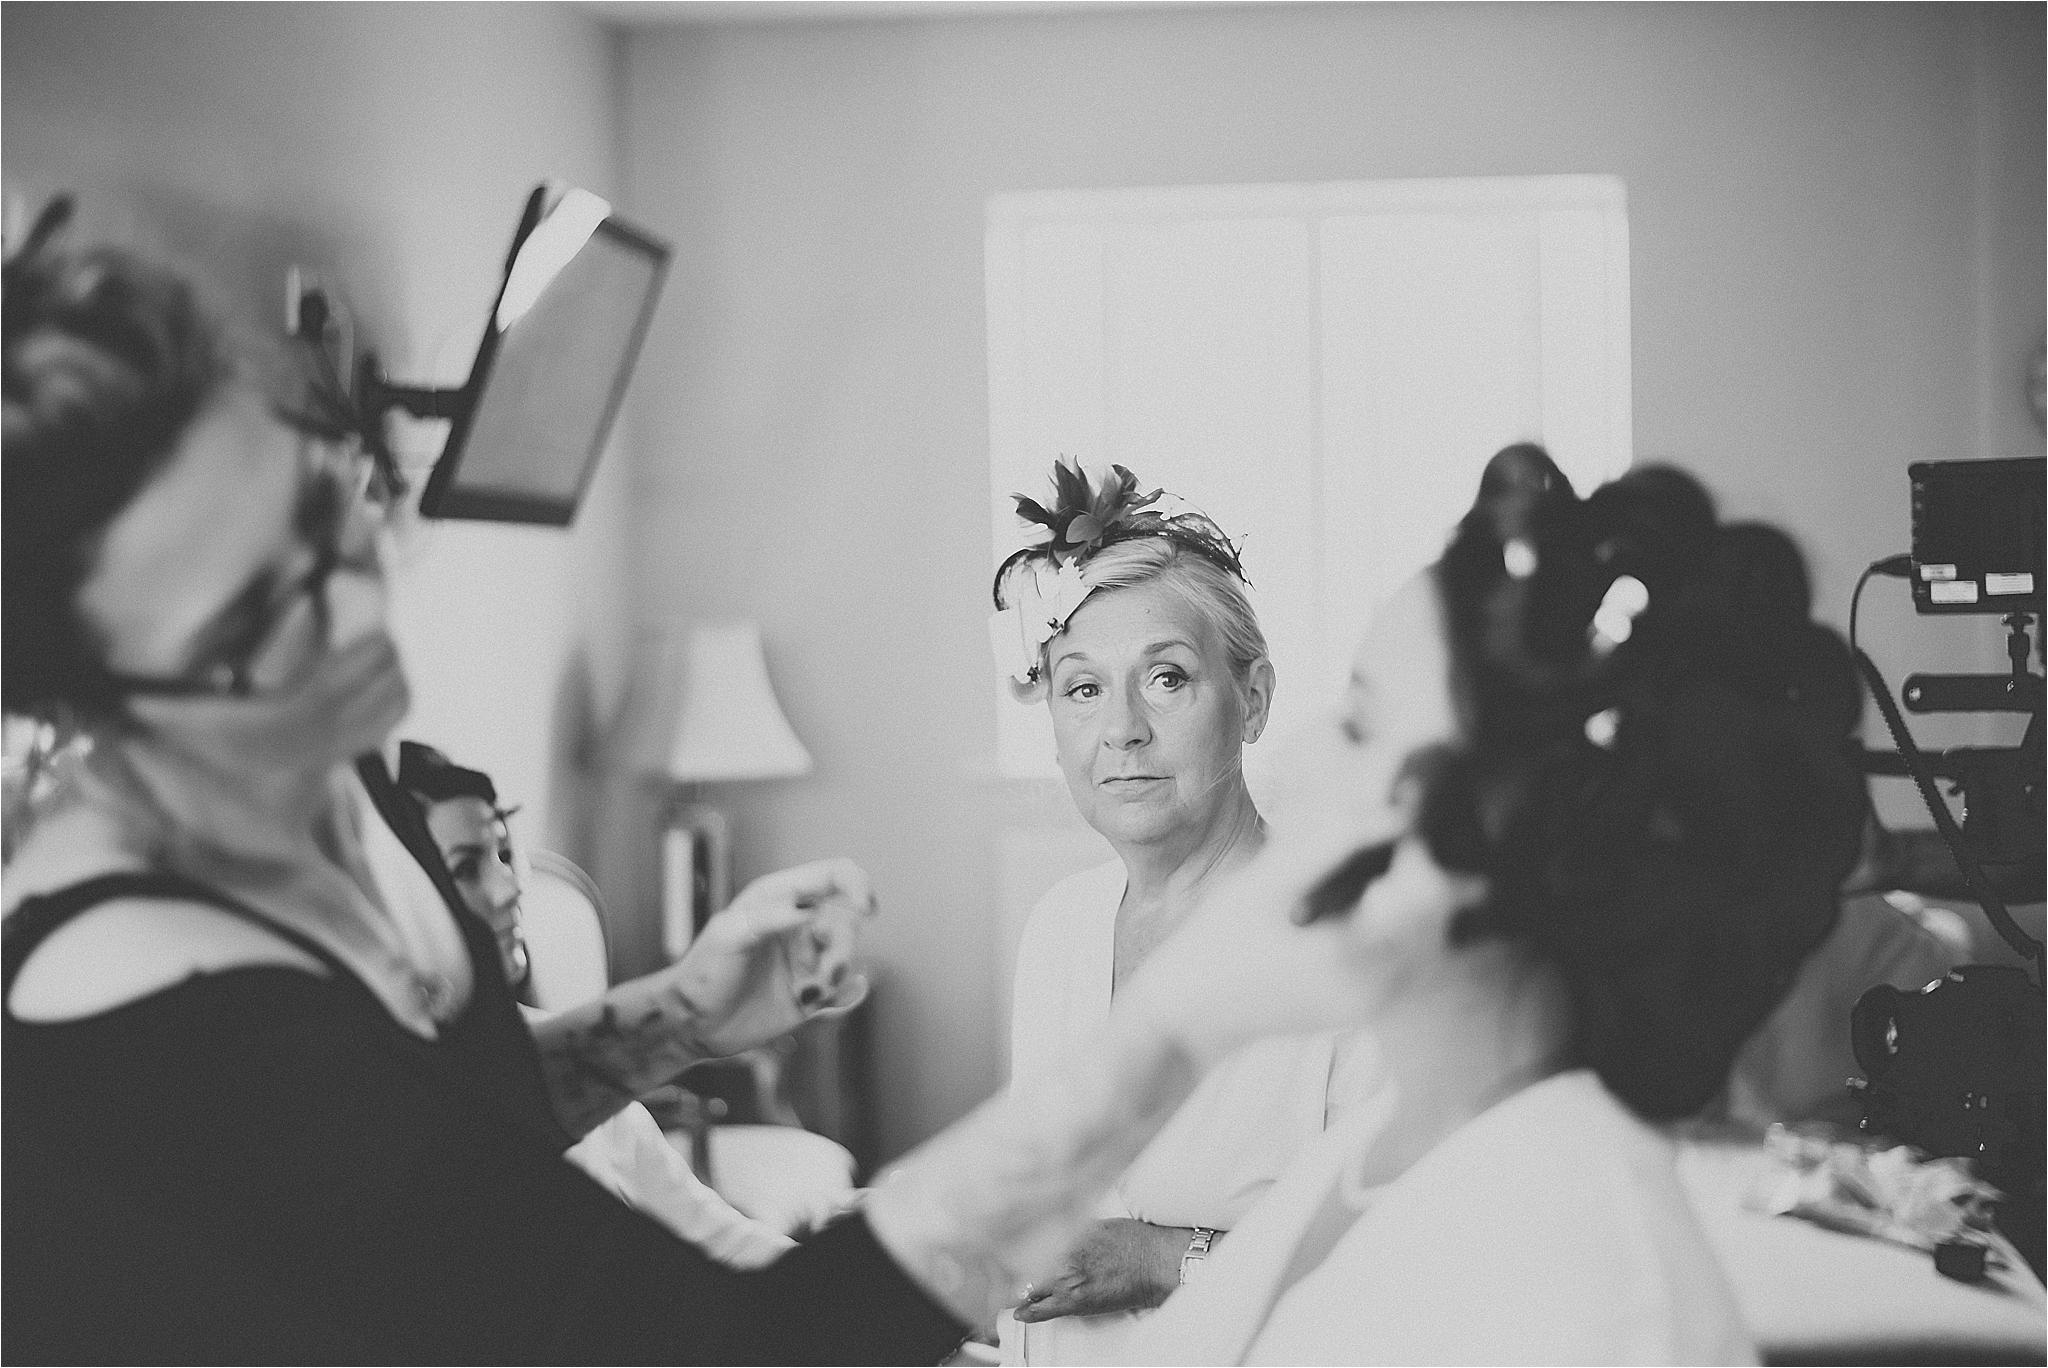 thevilla+lancashire+wreagreen+wedding+photographer17.jpg